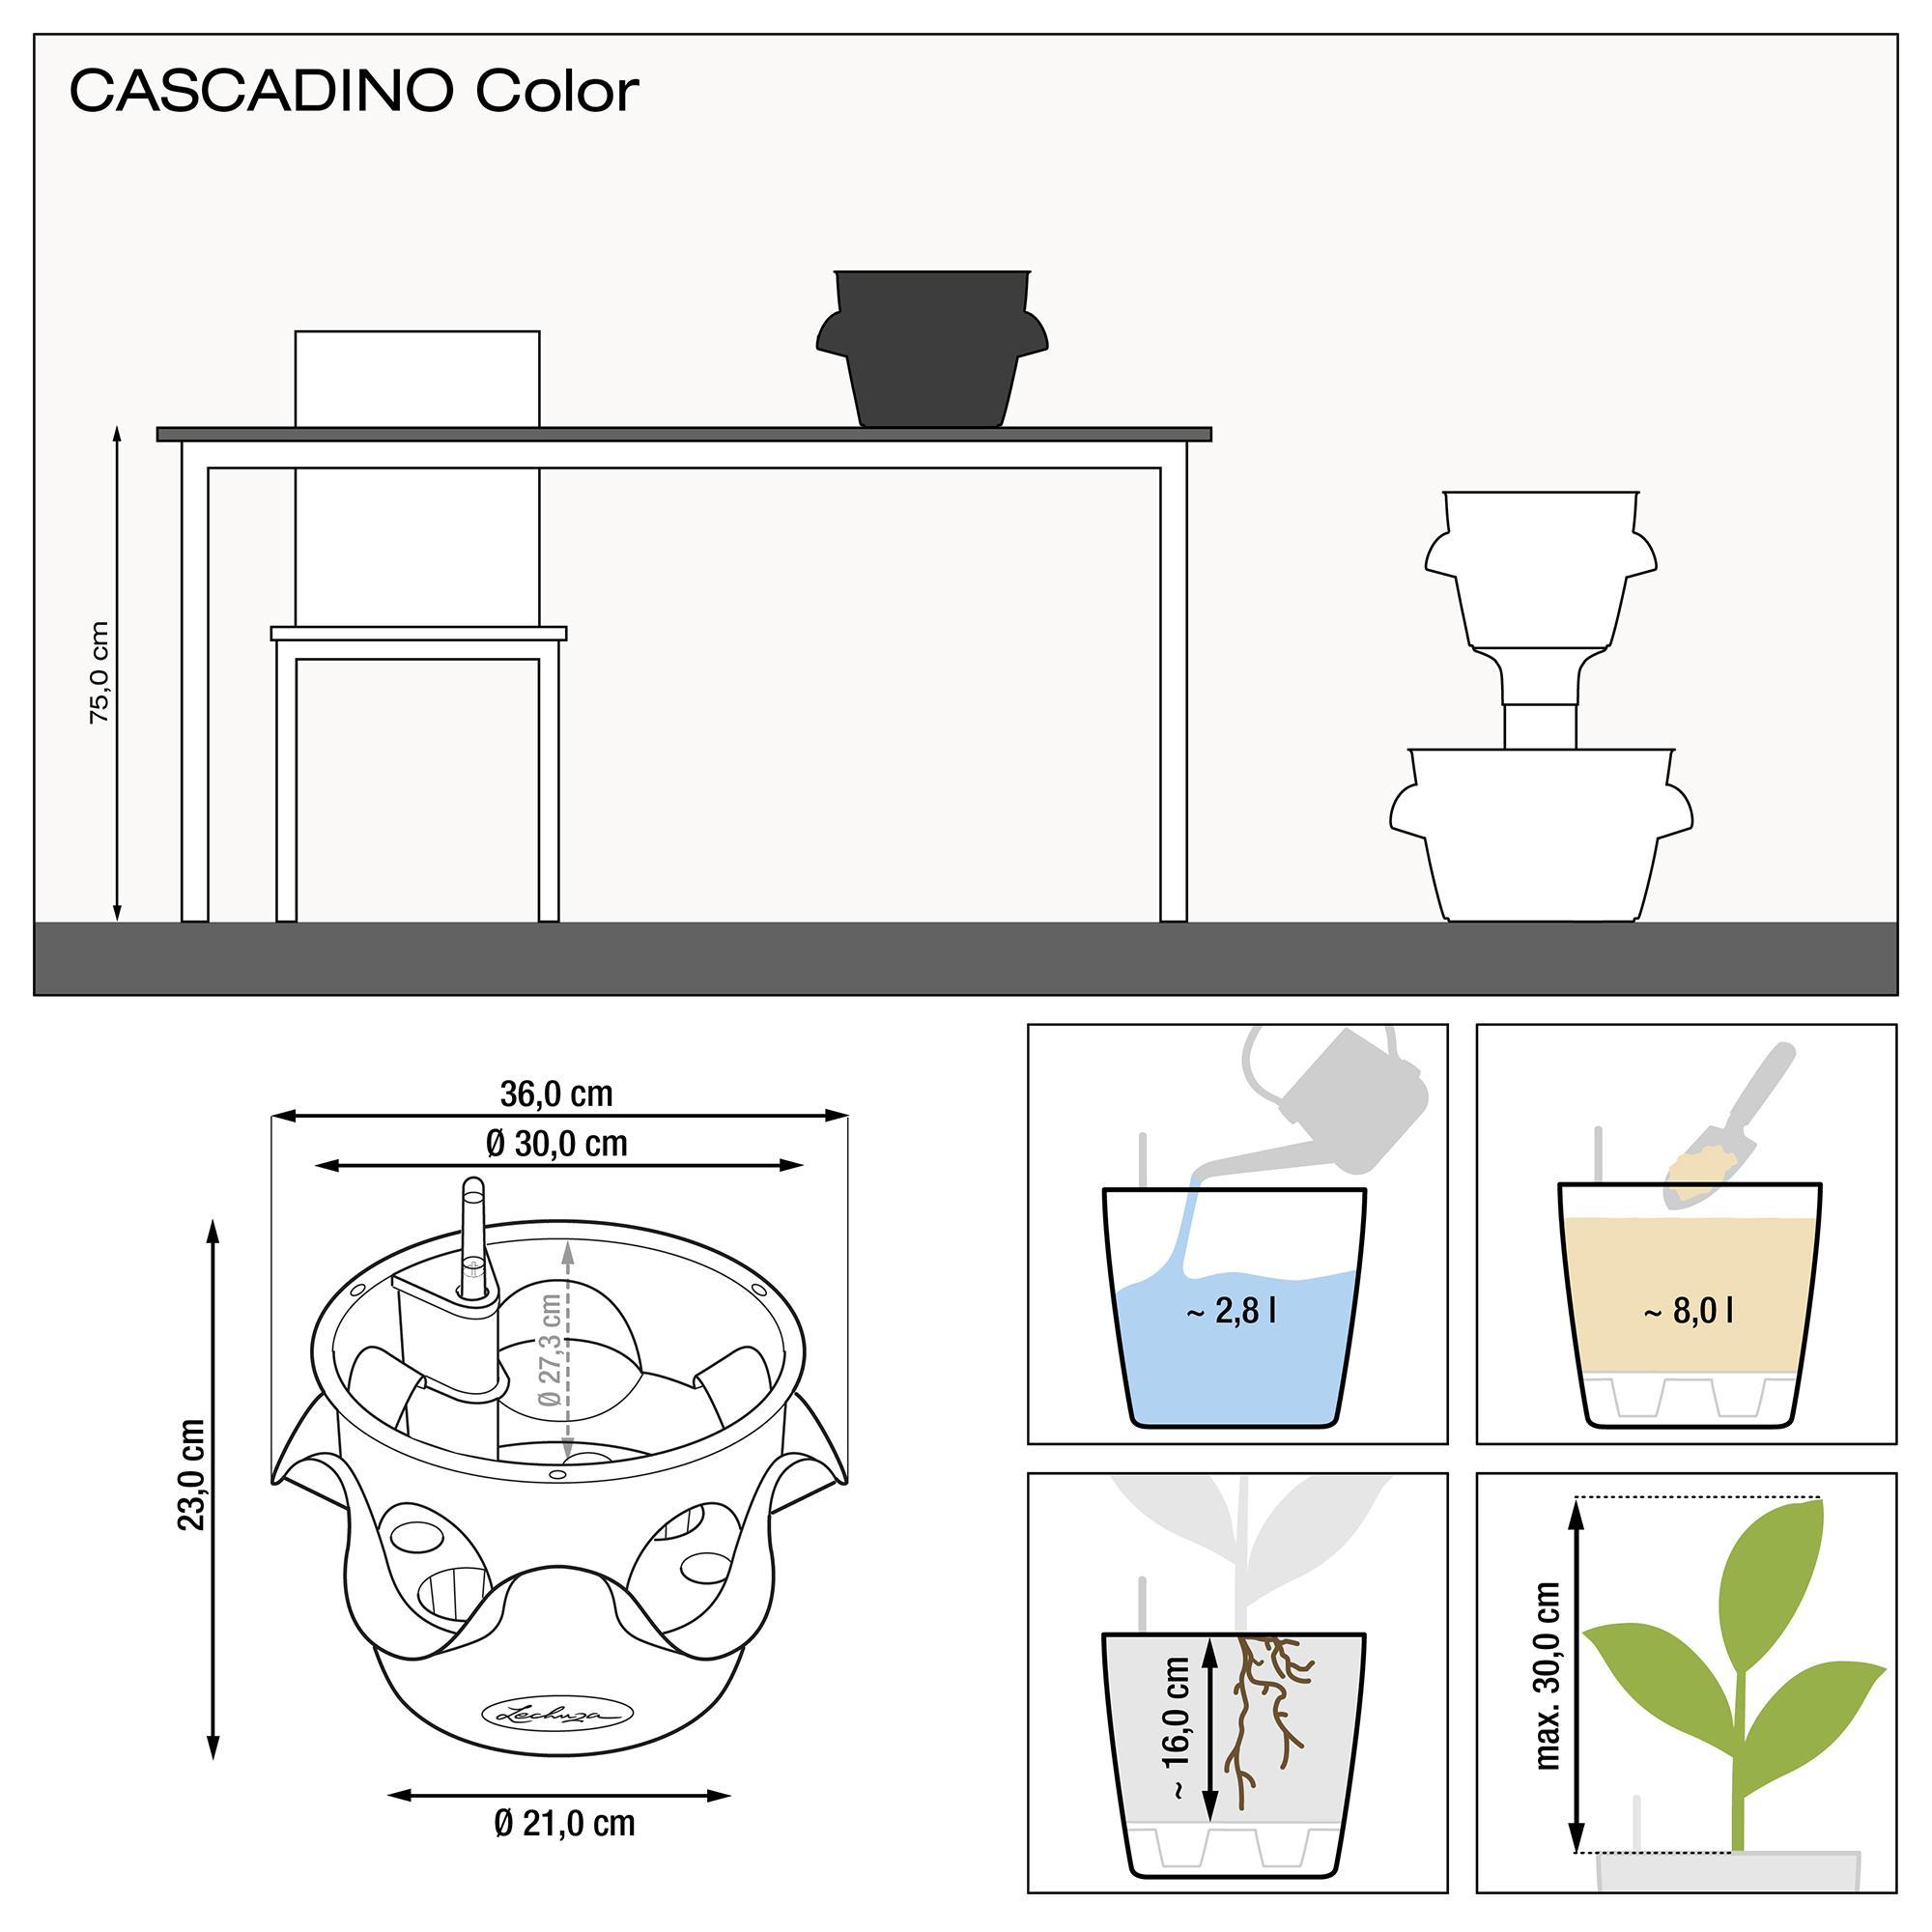 CASCADINO Color slate - Image 2